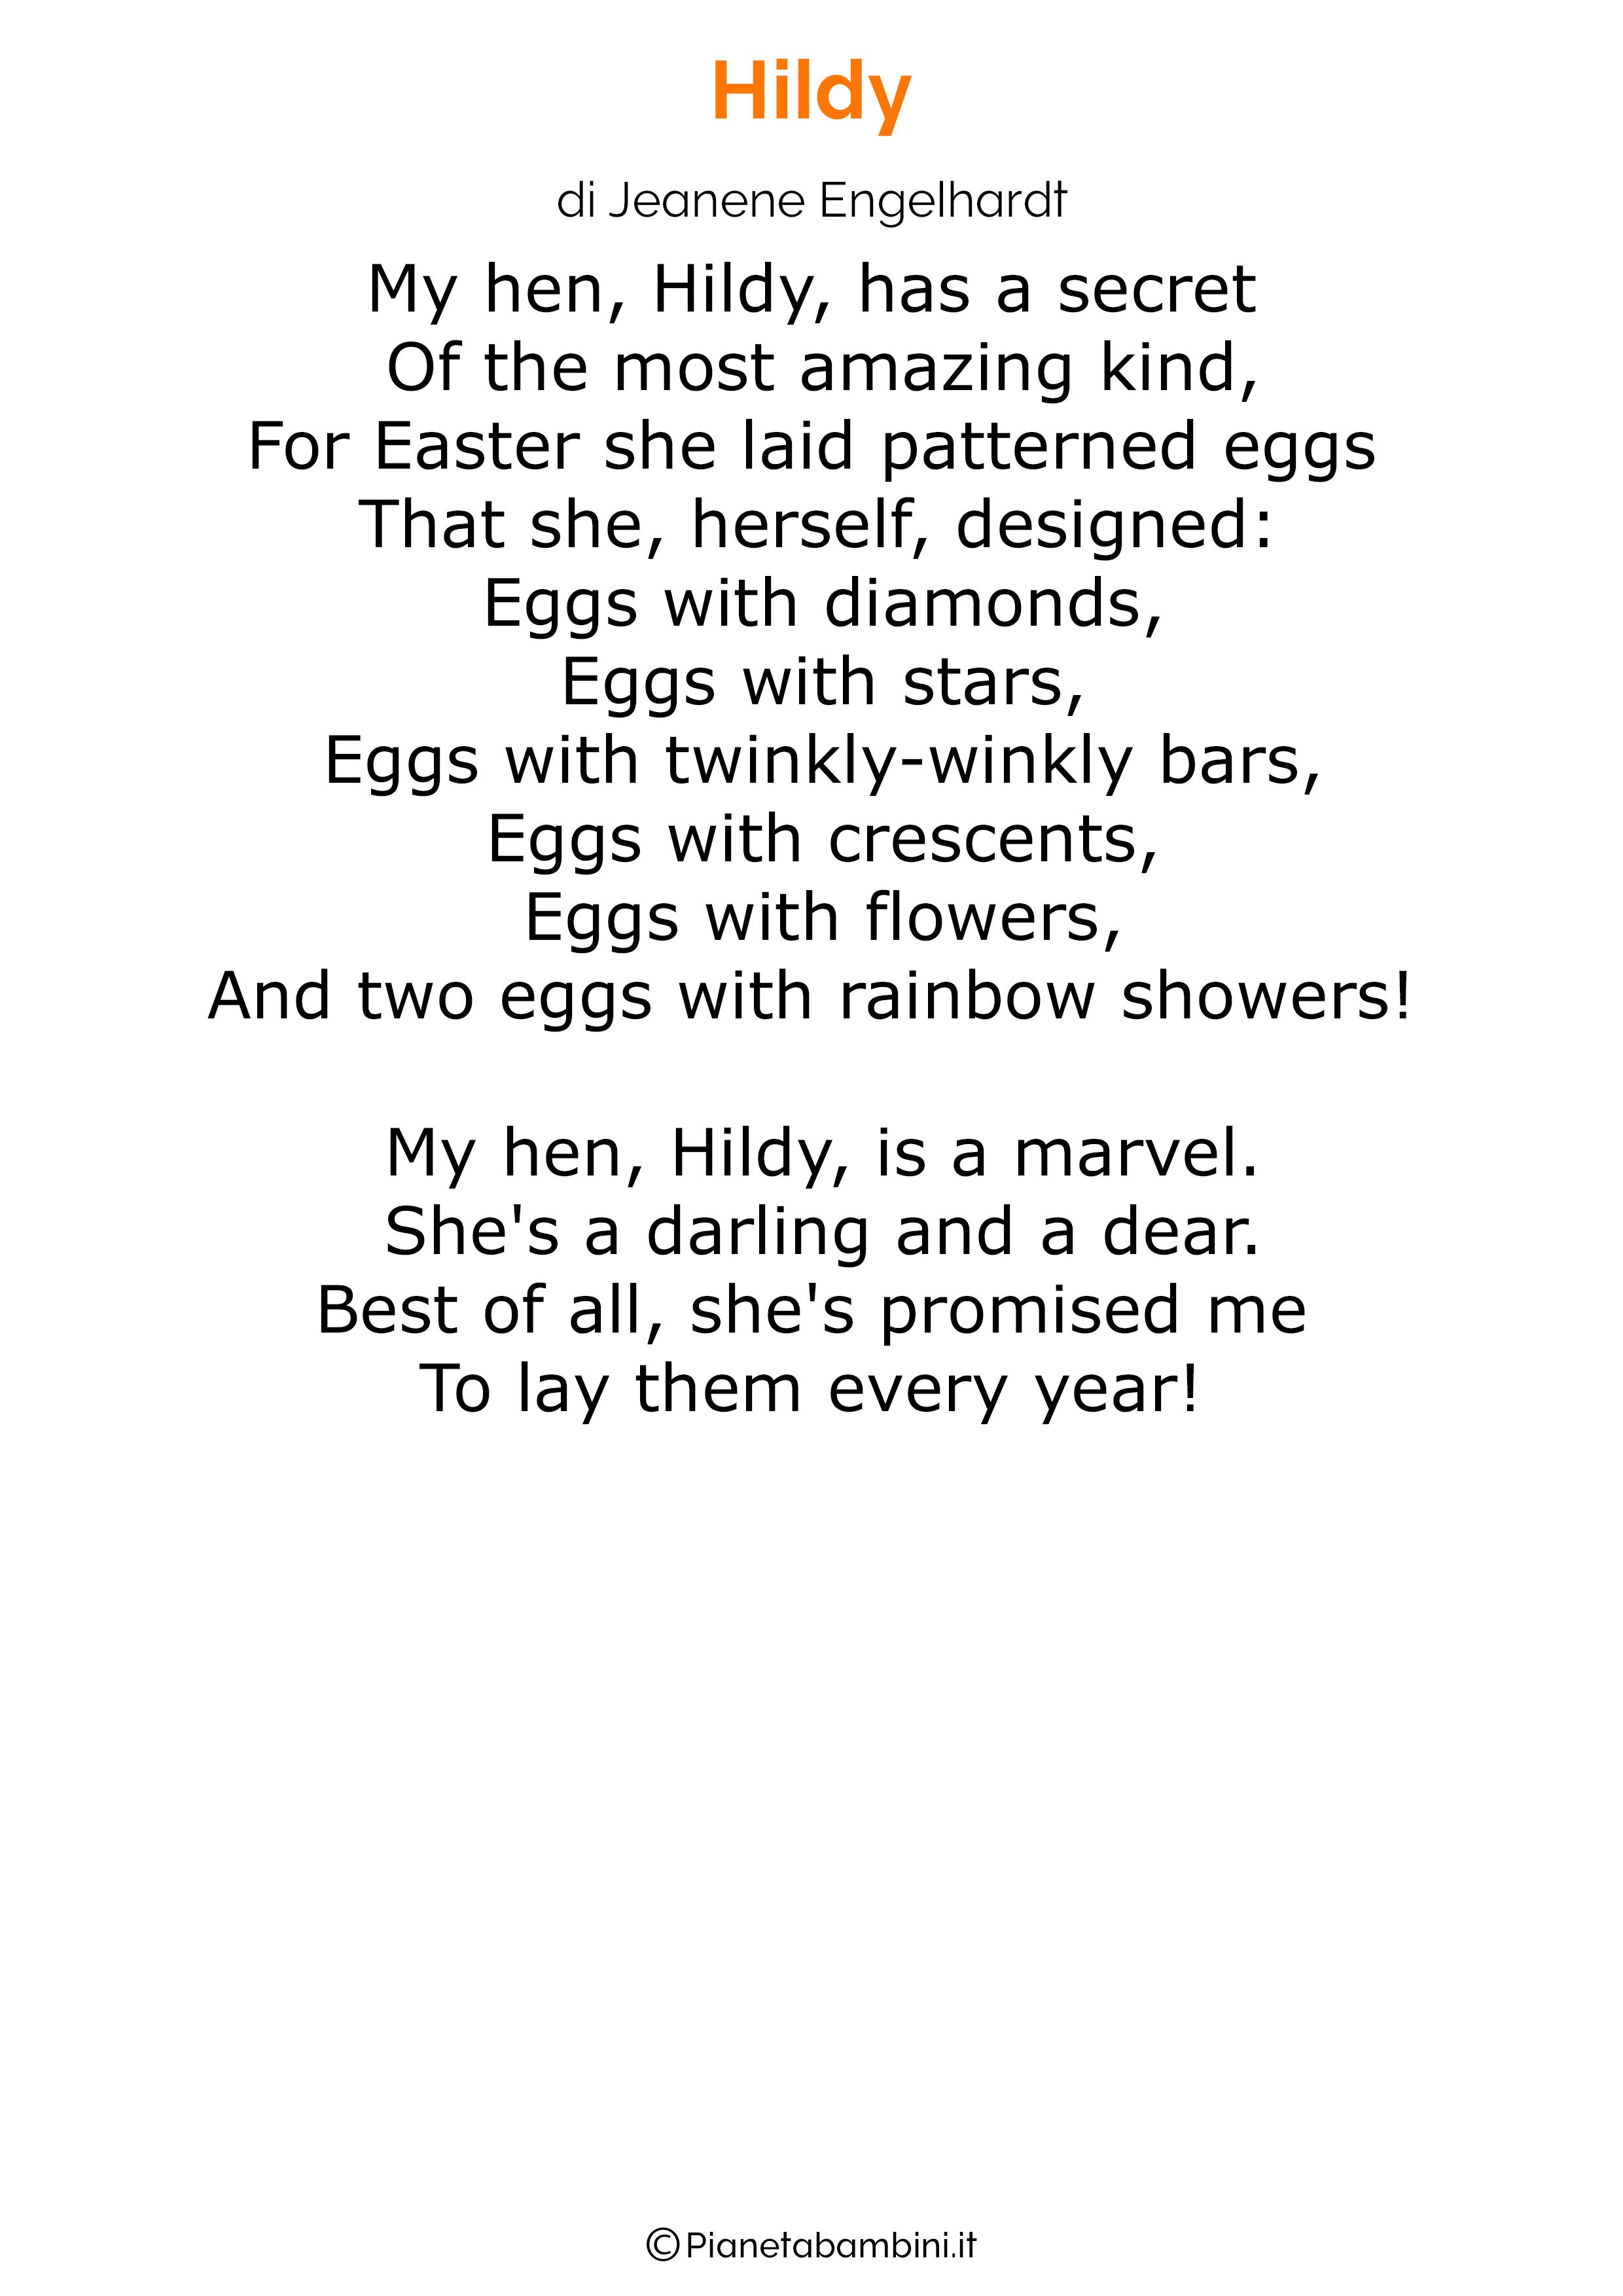 Poesie di Pasqua in inglese per bambini 27